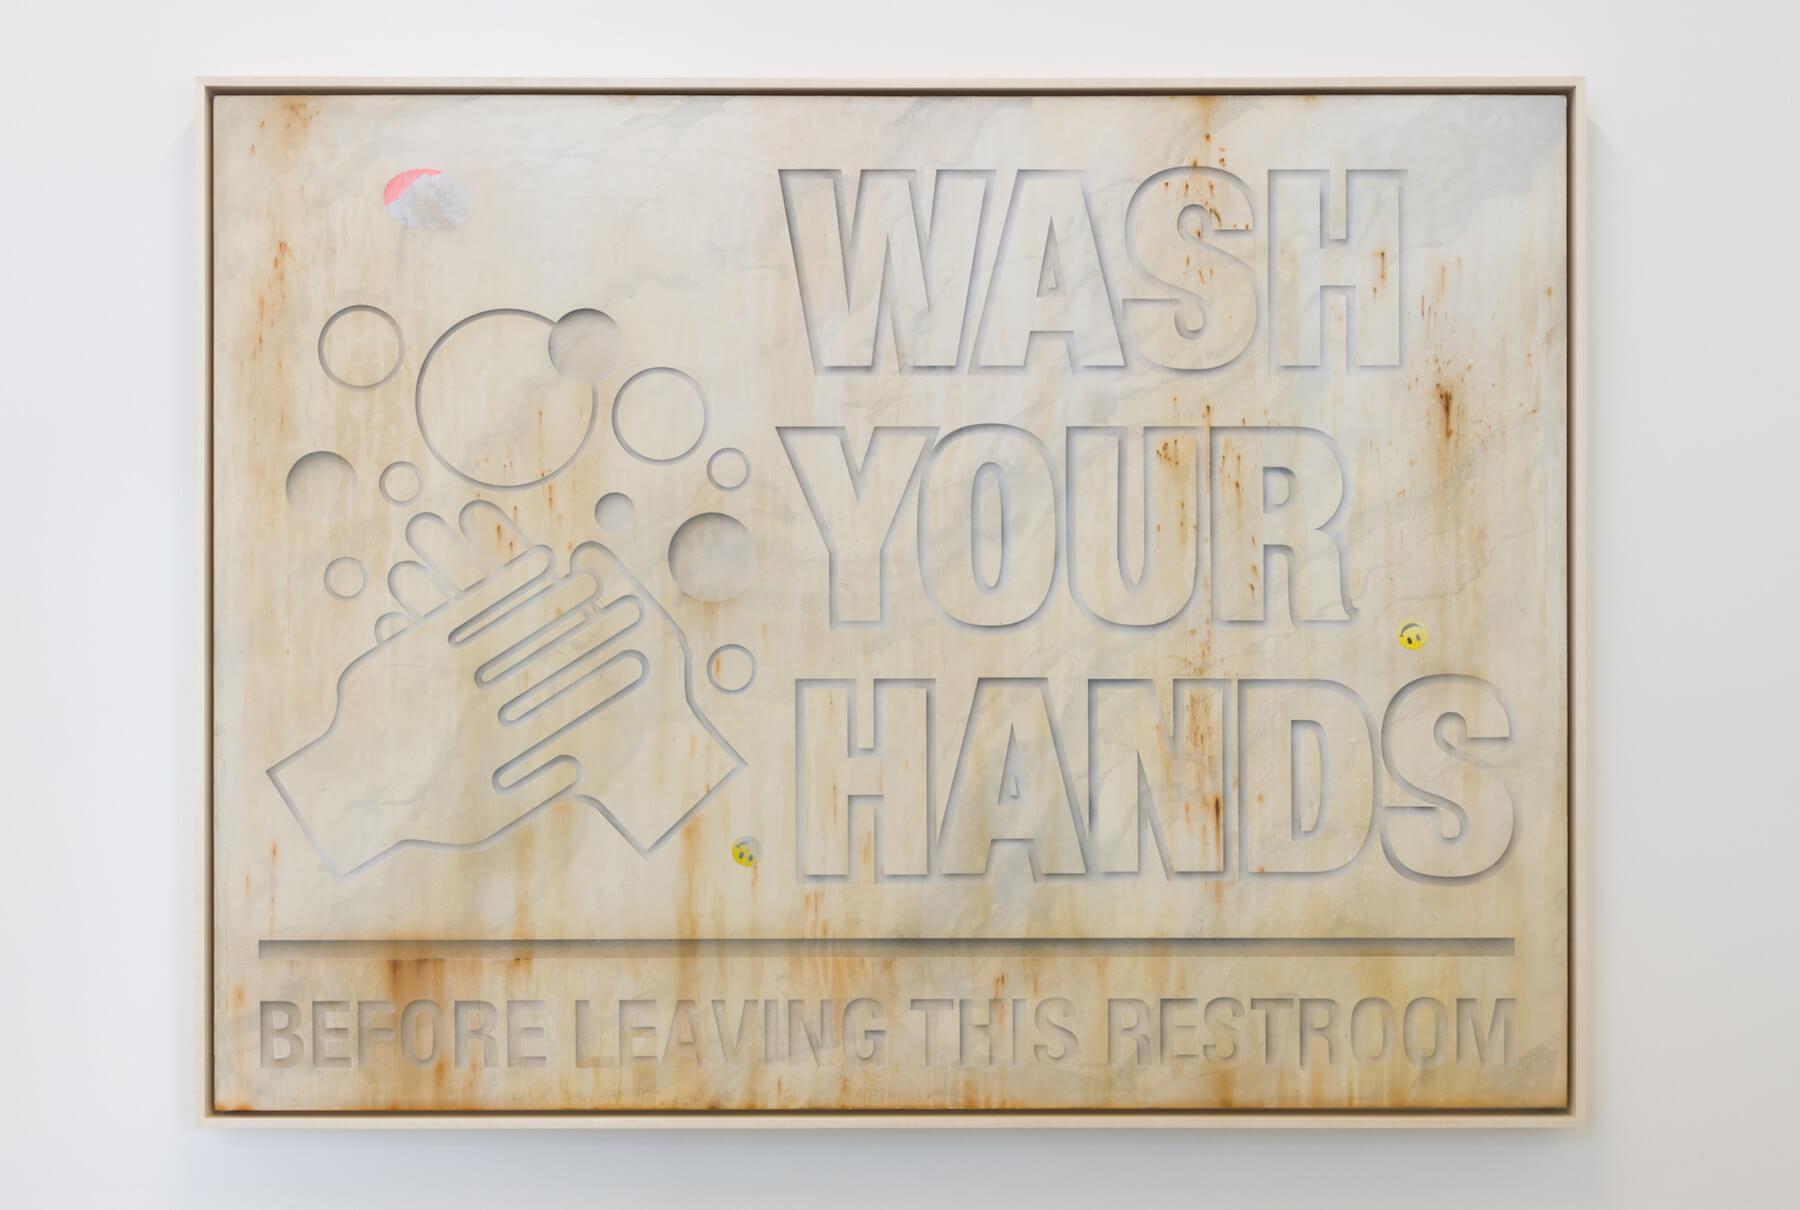 Gomez, Wash Your Hands Carrara Marble, 2017 (SG 17.029) A